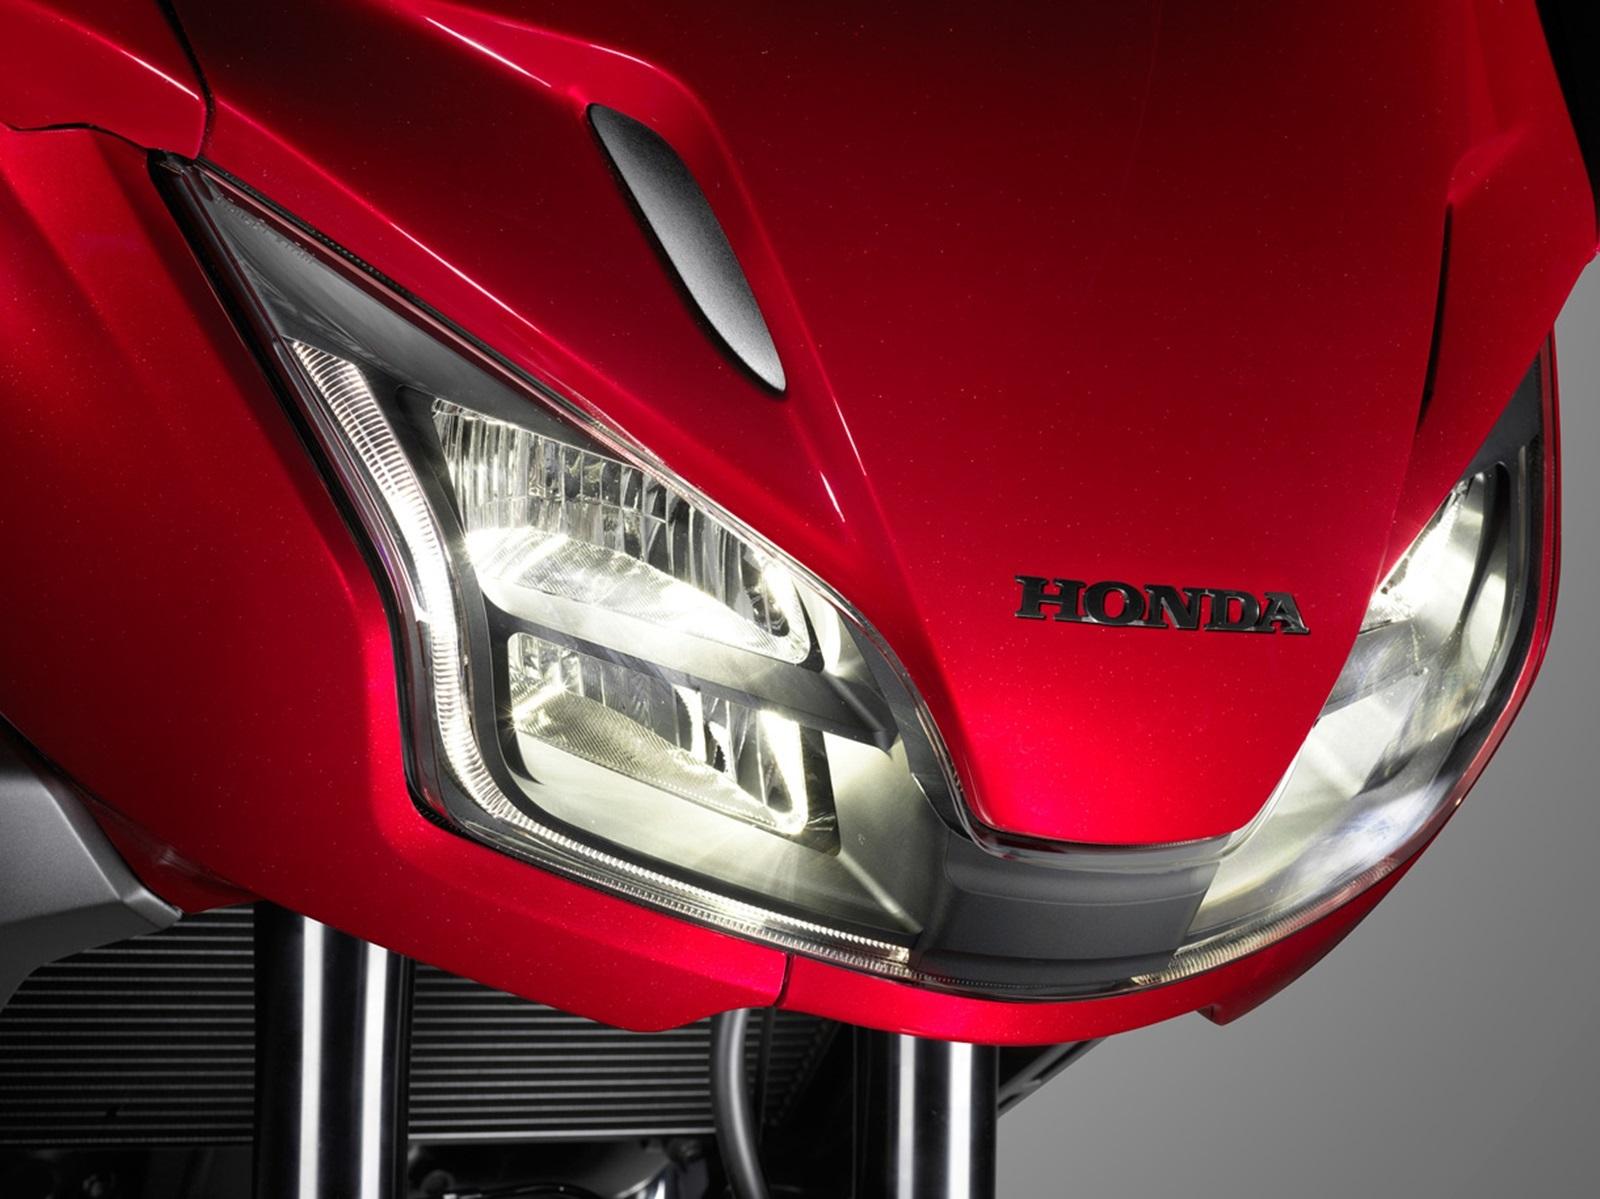 Foto de Honda VTX 1300 en detalle (9/20)